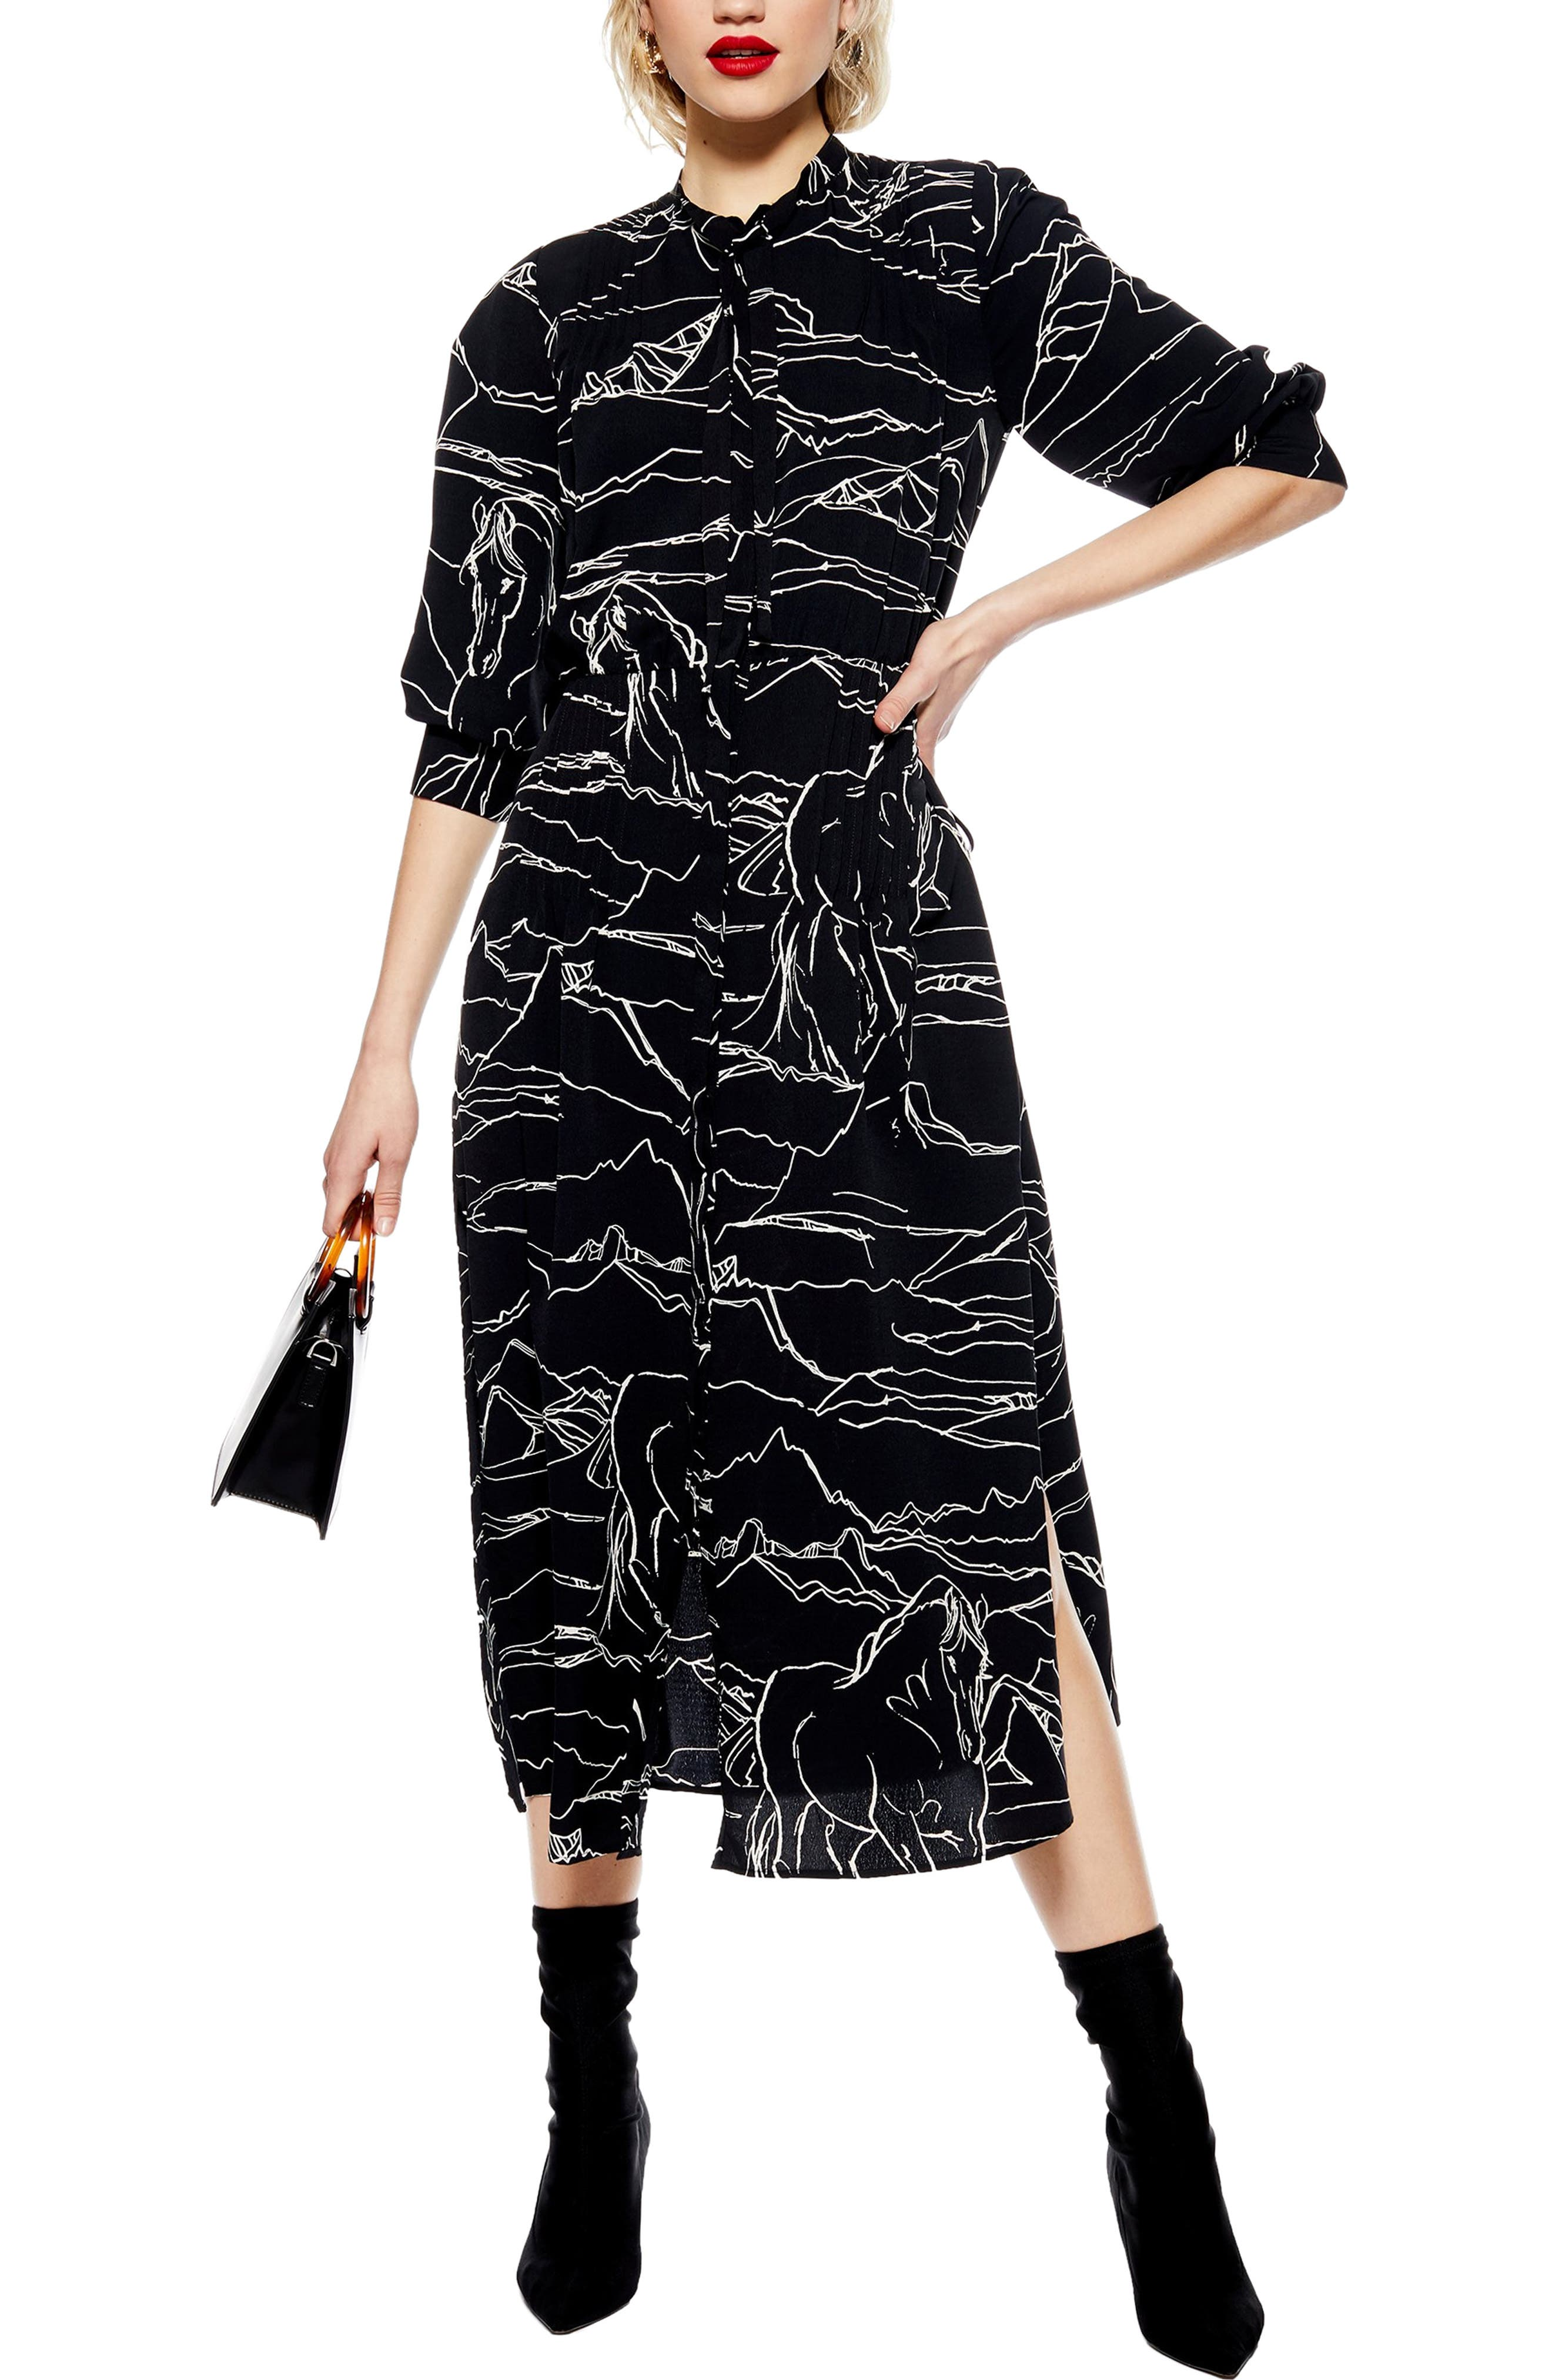 Topshop Horse Print Midi Dress, US (fits like 2-4) - Black